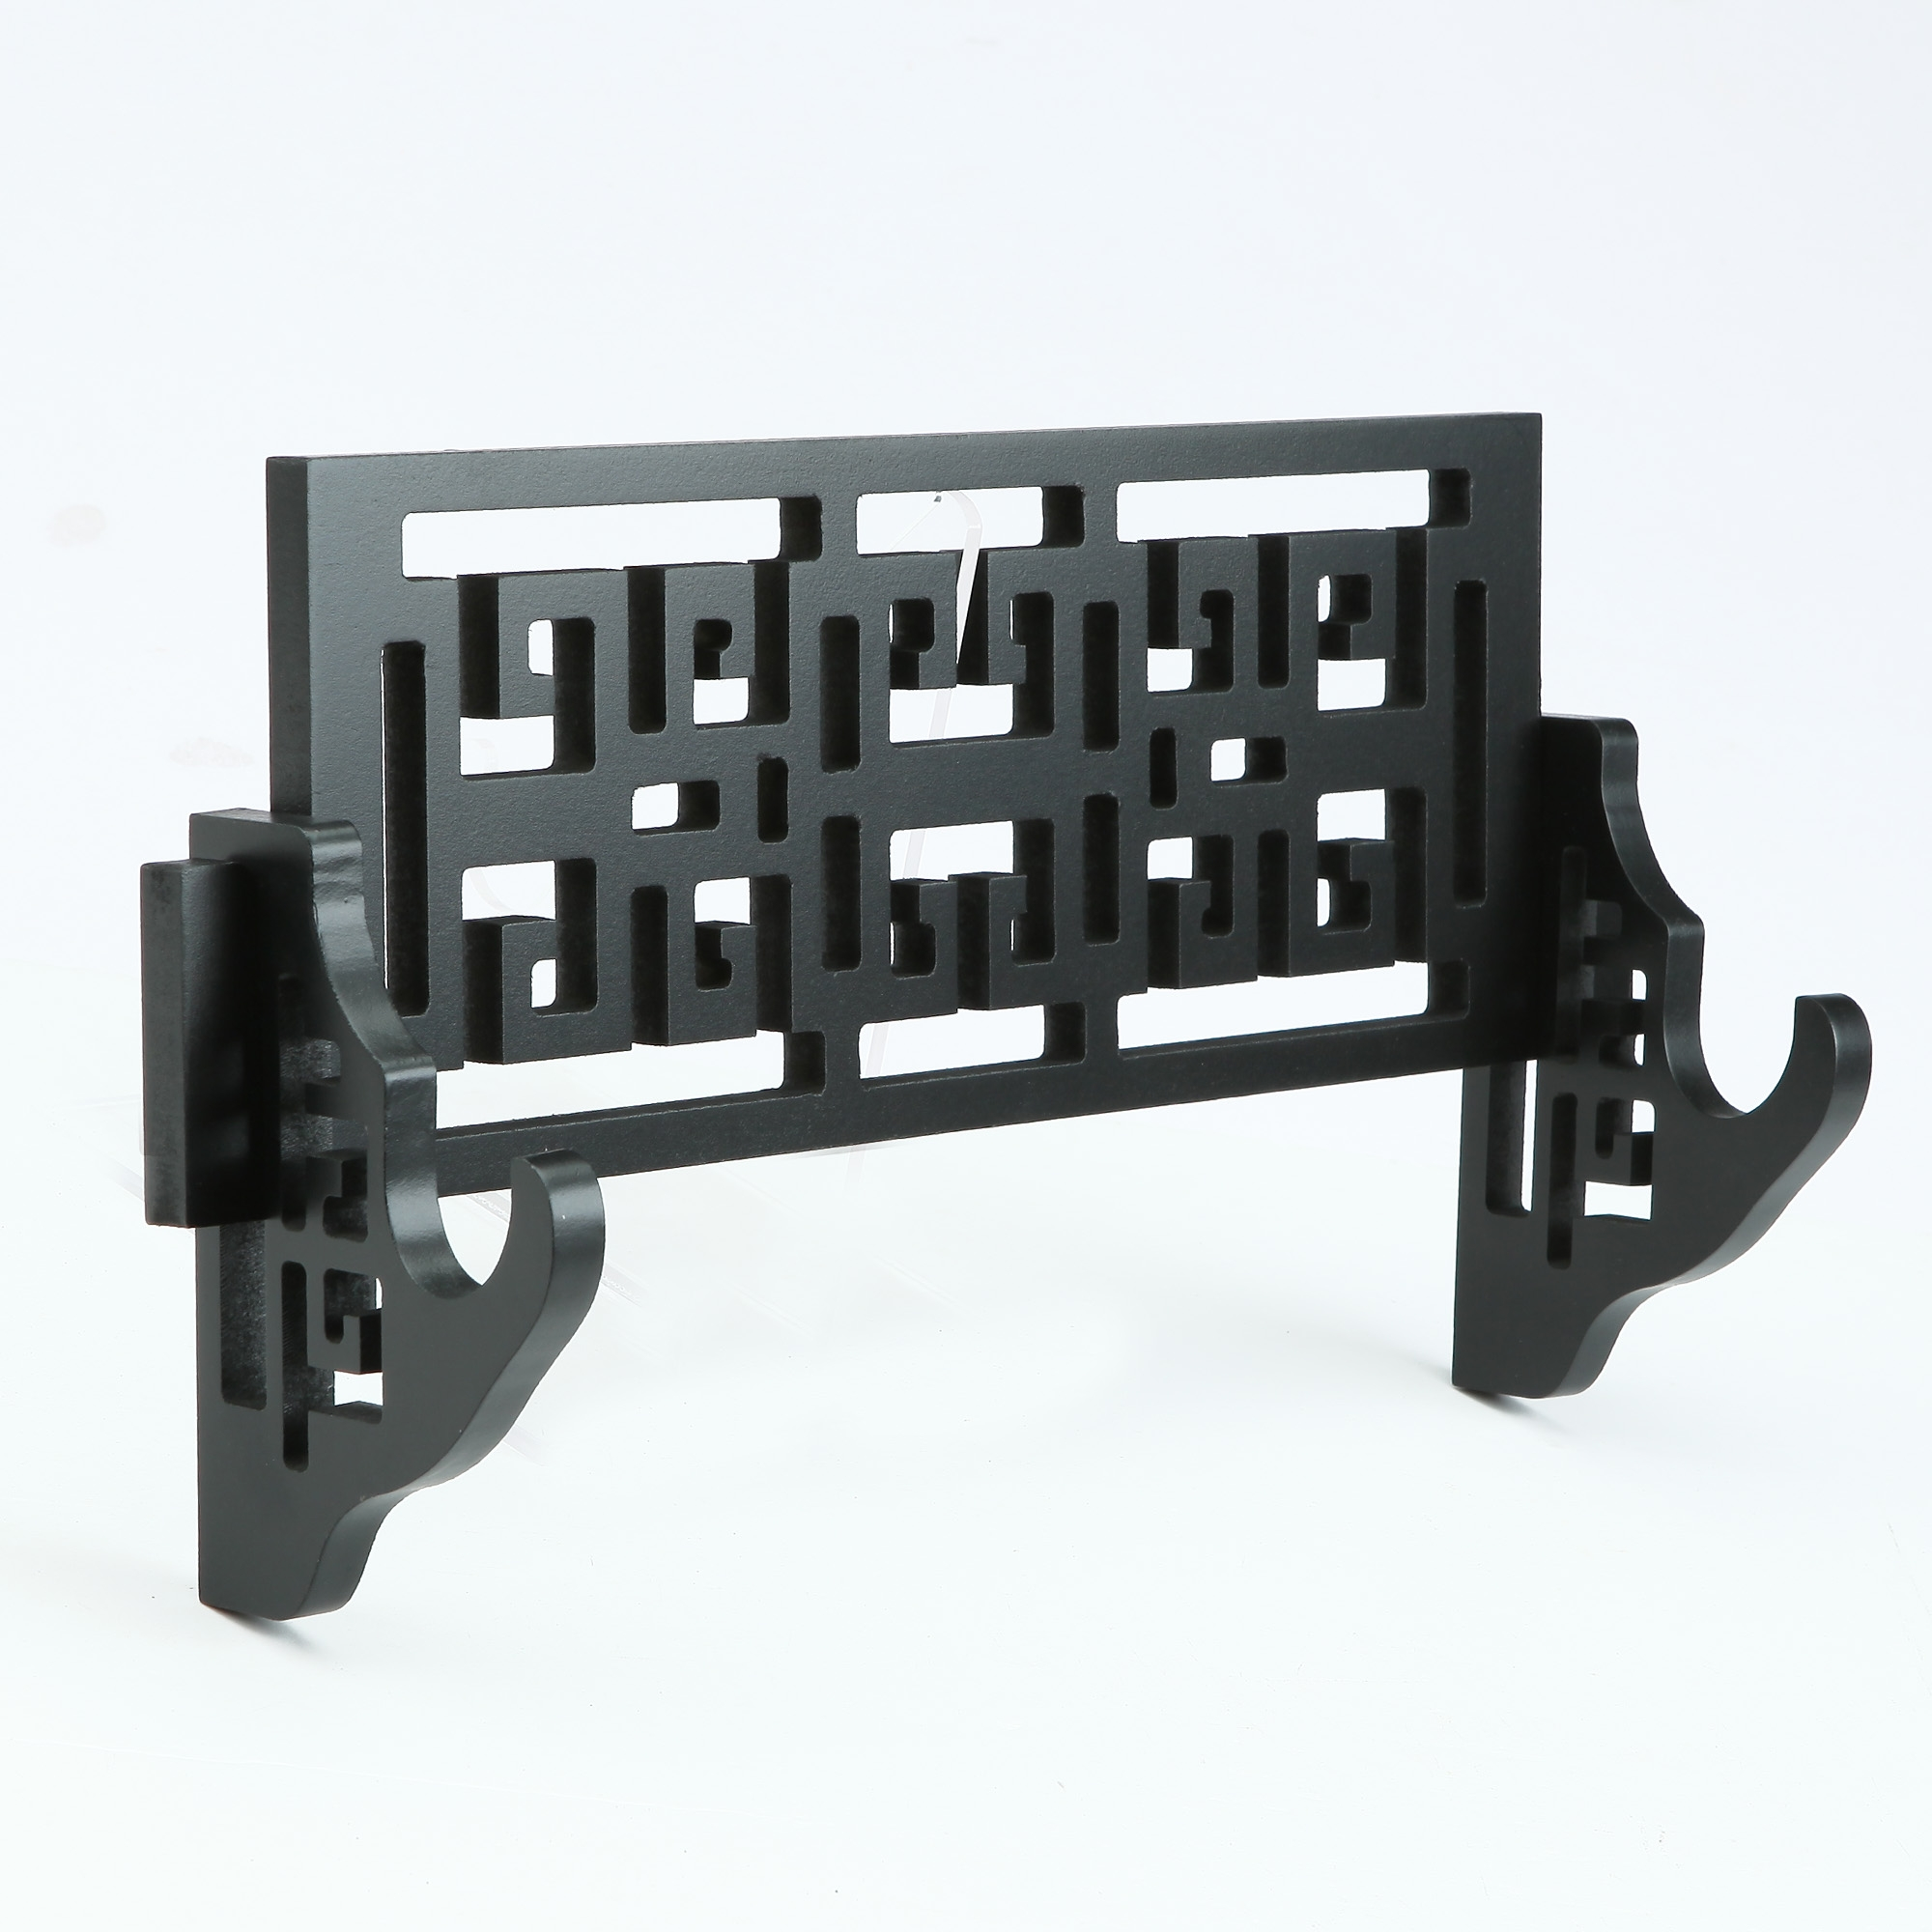 Handmade Black Wooden Single Tier Katana Sword Stand Holder Display Rack Stand Wall Mount